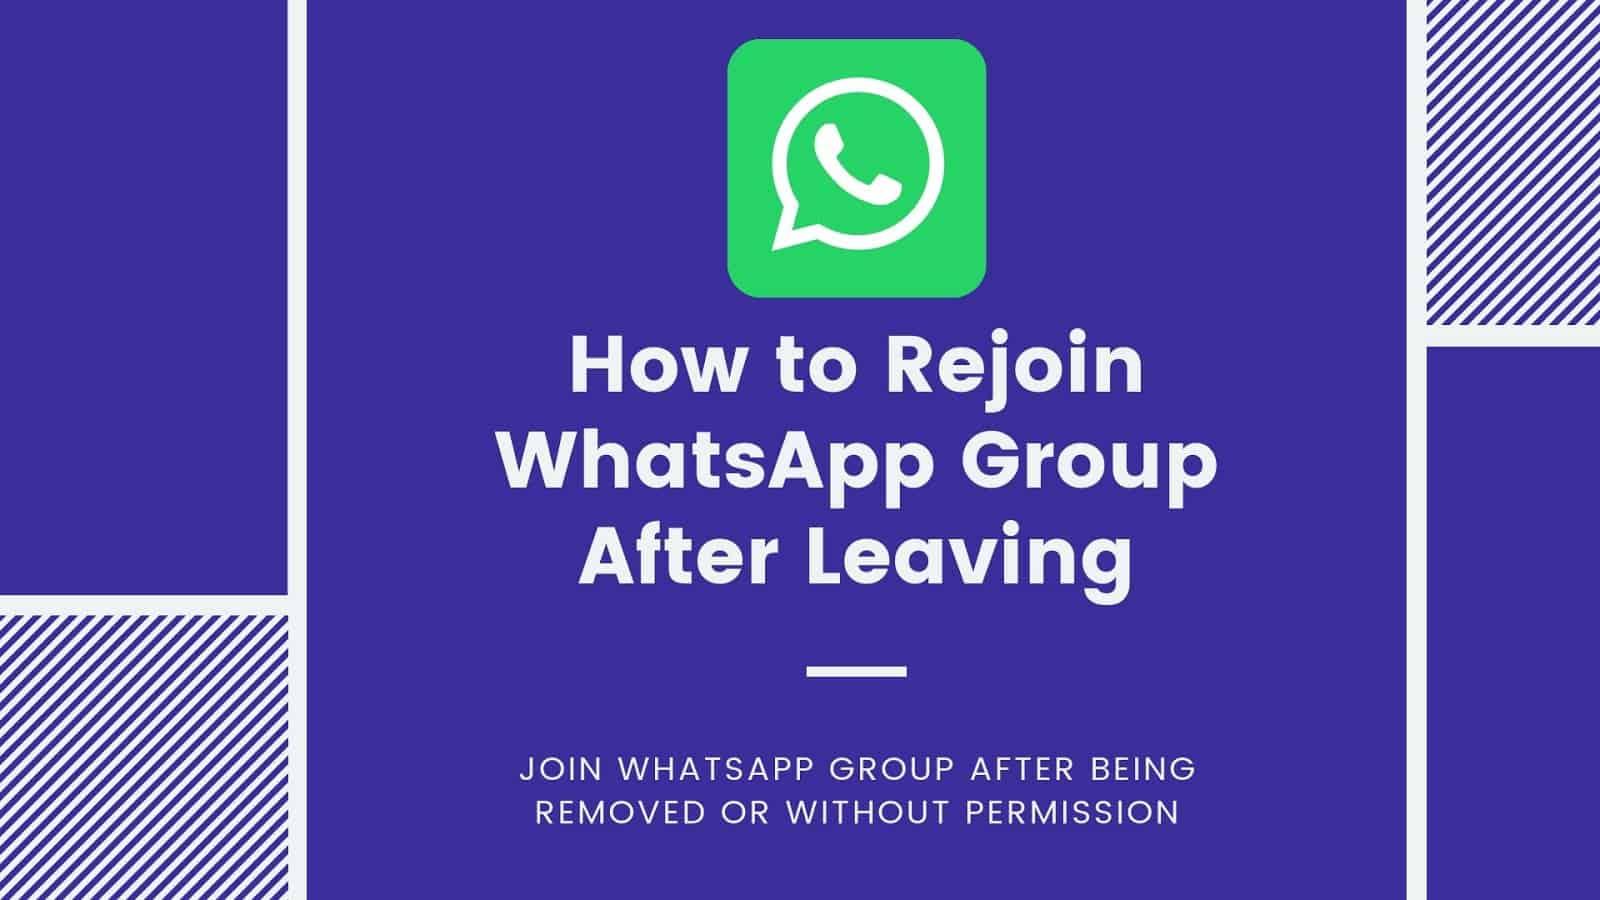 Rejoin WhatsApp Group